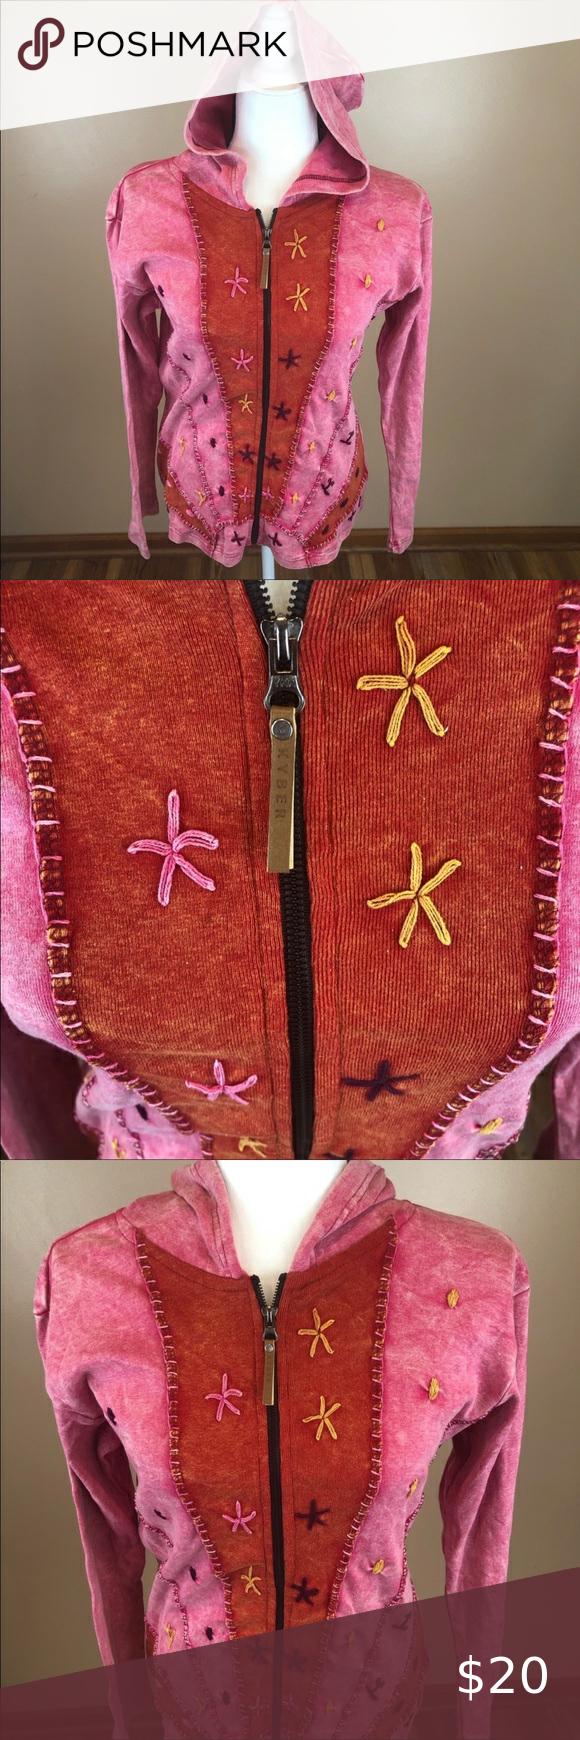 Kyber Pink Boho Patchwork Hooded Zip Up Jacket Kyber Boho Style Patchwork Outerwear Zip Up Jacket With Hood Hooded Sw Pink Boho Sweatshirt Fashion Mint Dress [ 1740 x 580 Pixel ]